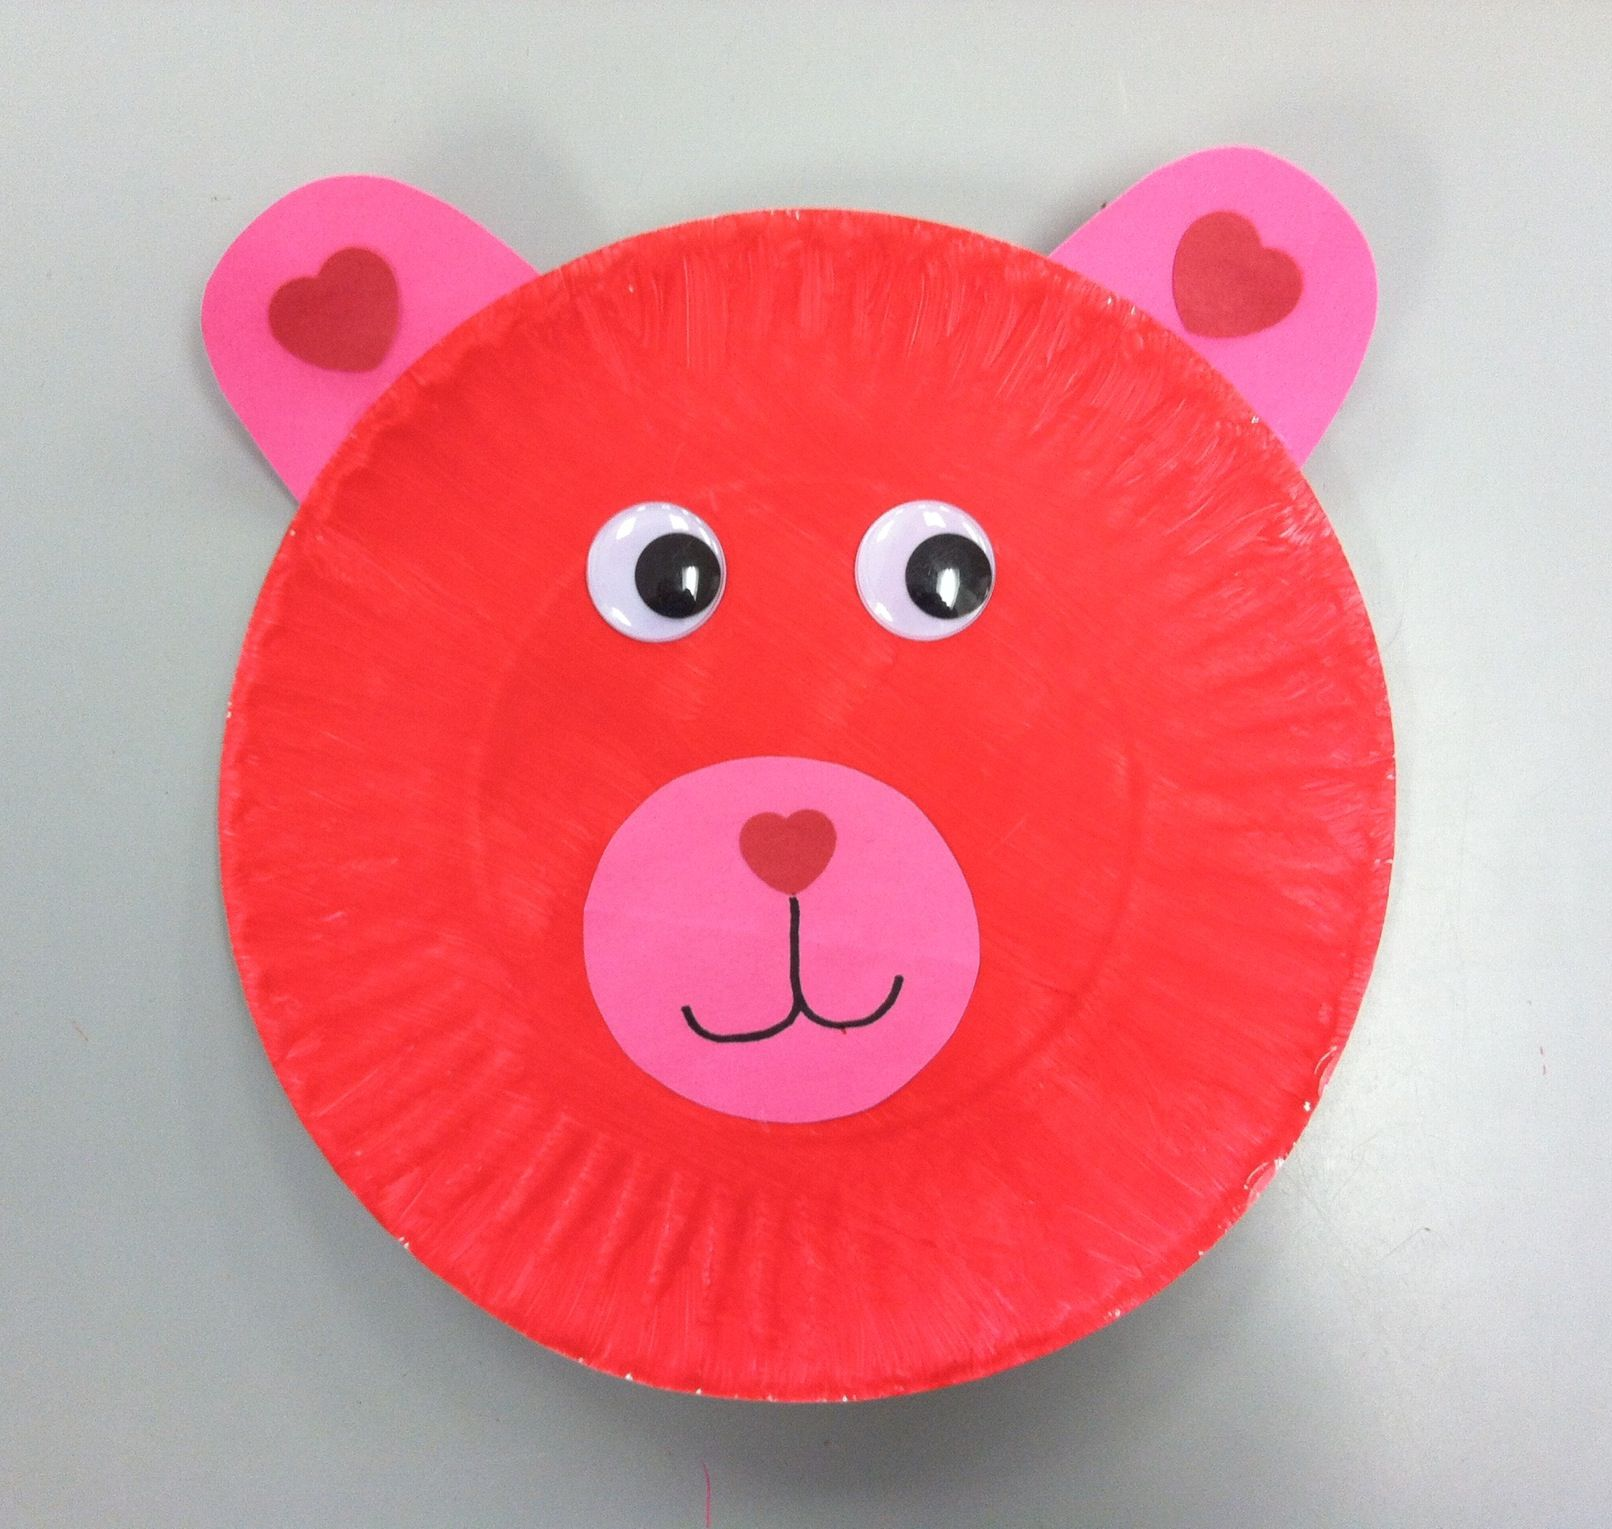 Preschool Art Project February